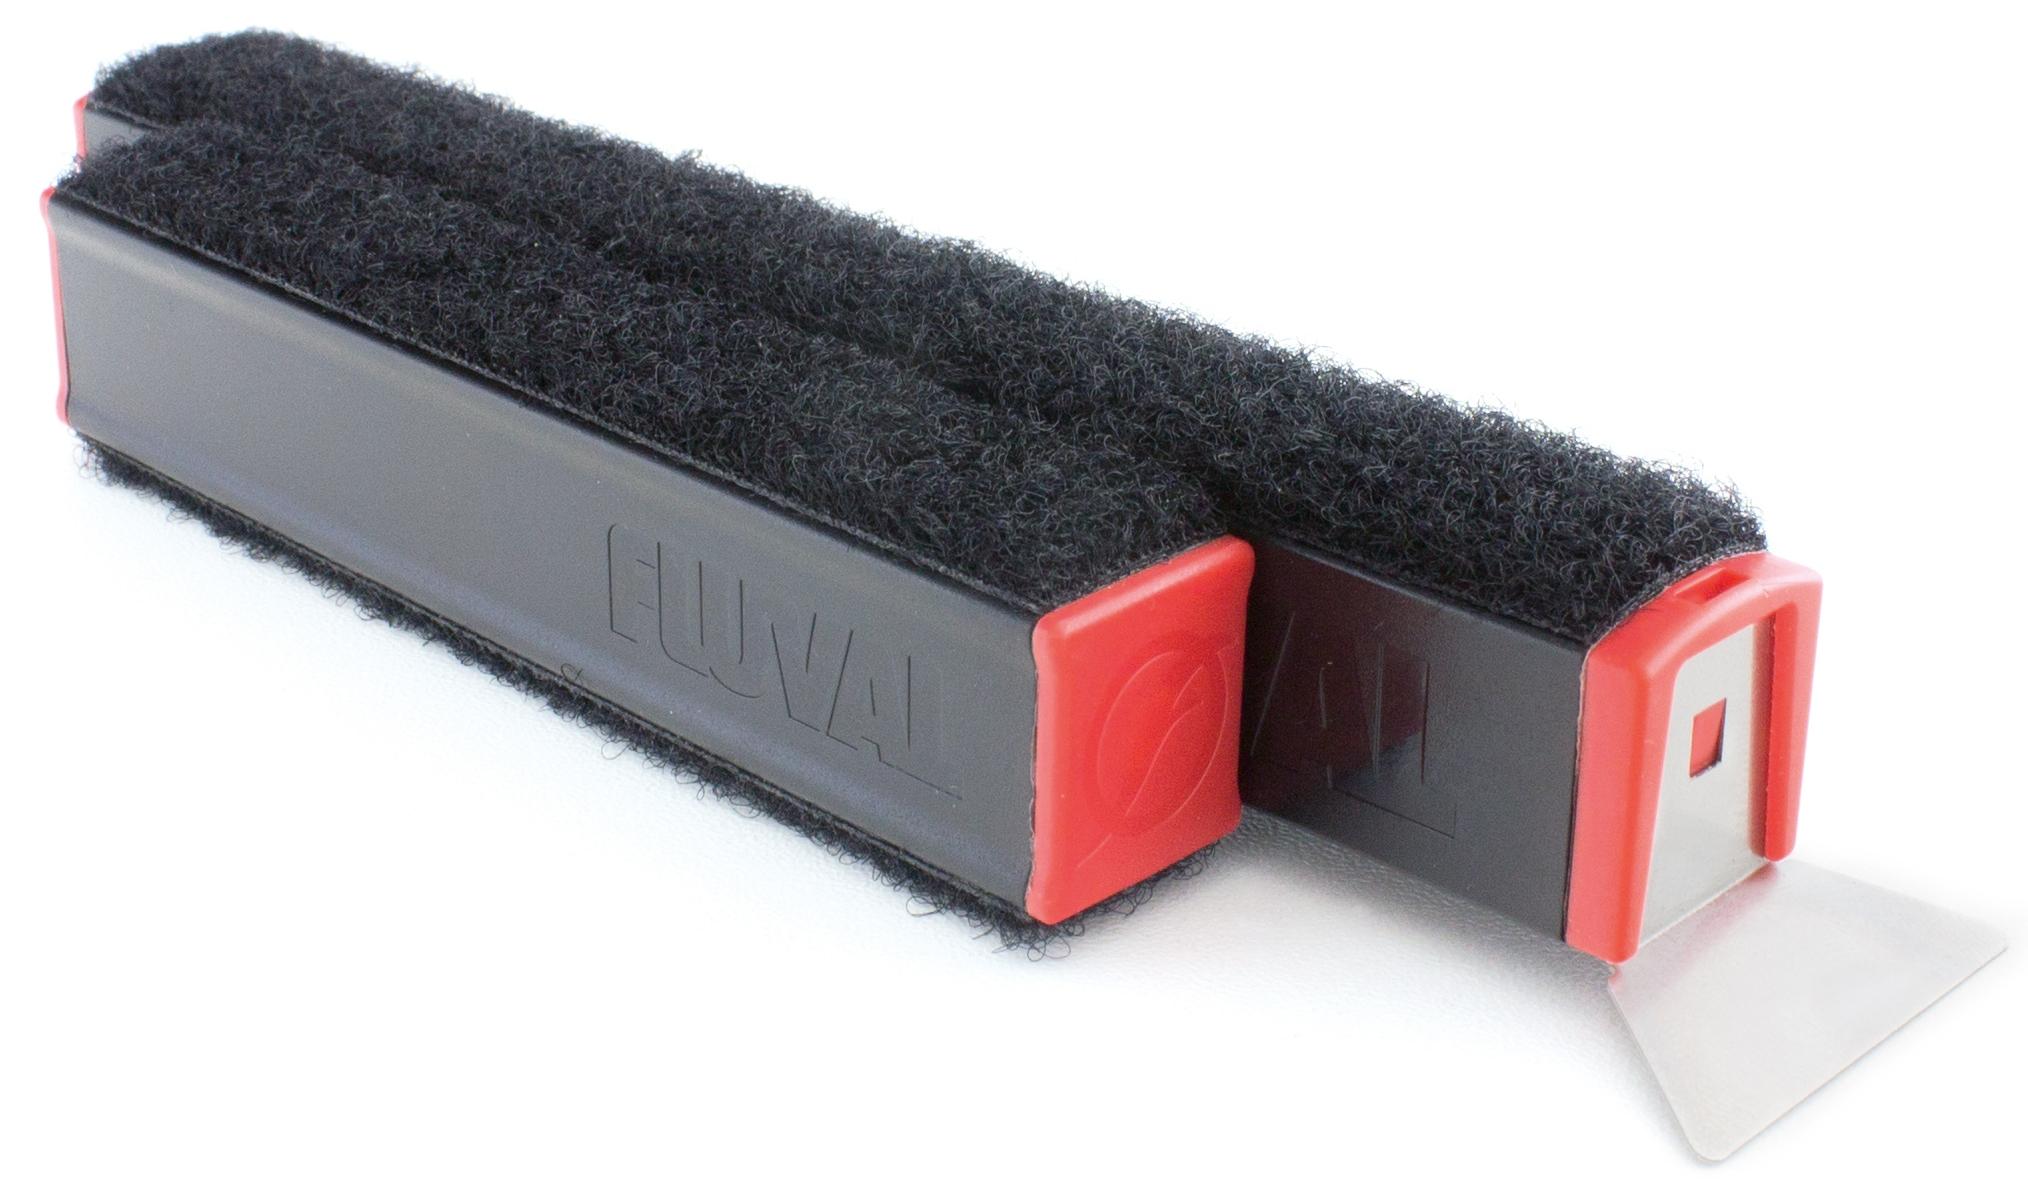 Shop Fluval Razor+ S -Algae cleaner with blade-